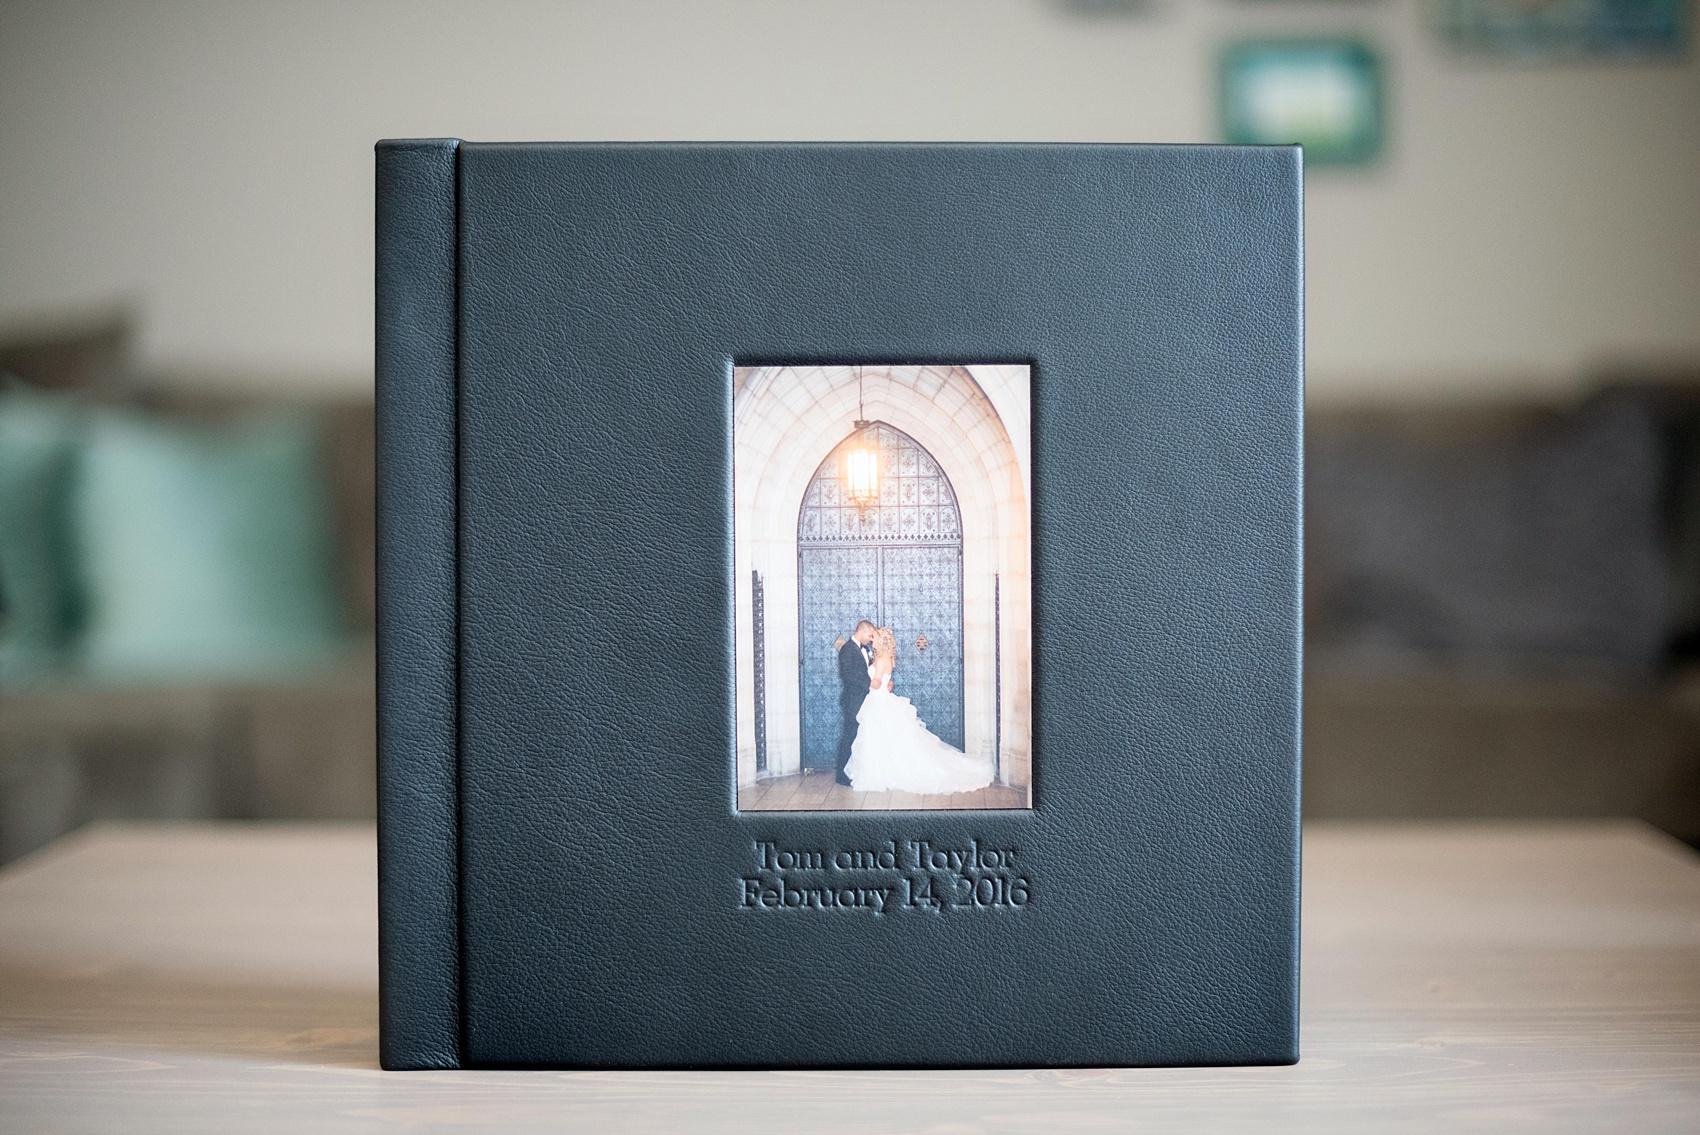 Mikkel Paige Photography Photos Of A Black Fine Art Leather Wedding Album With Subtle Disney